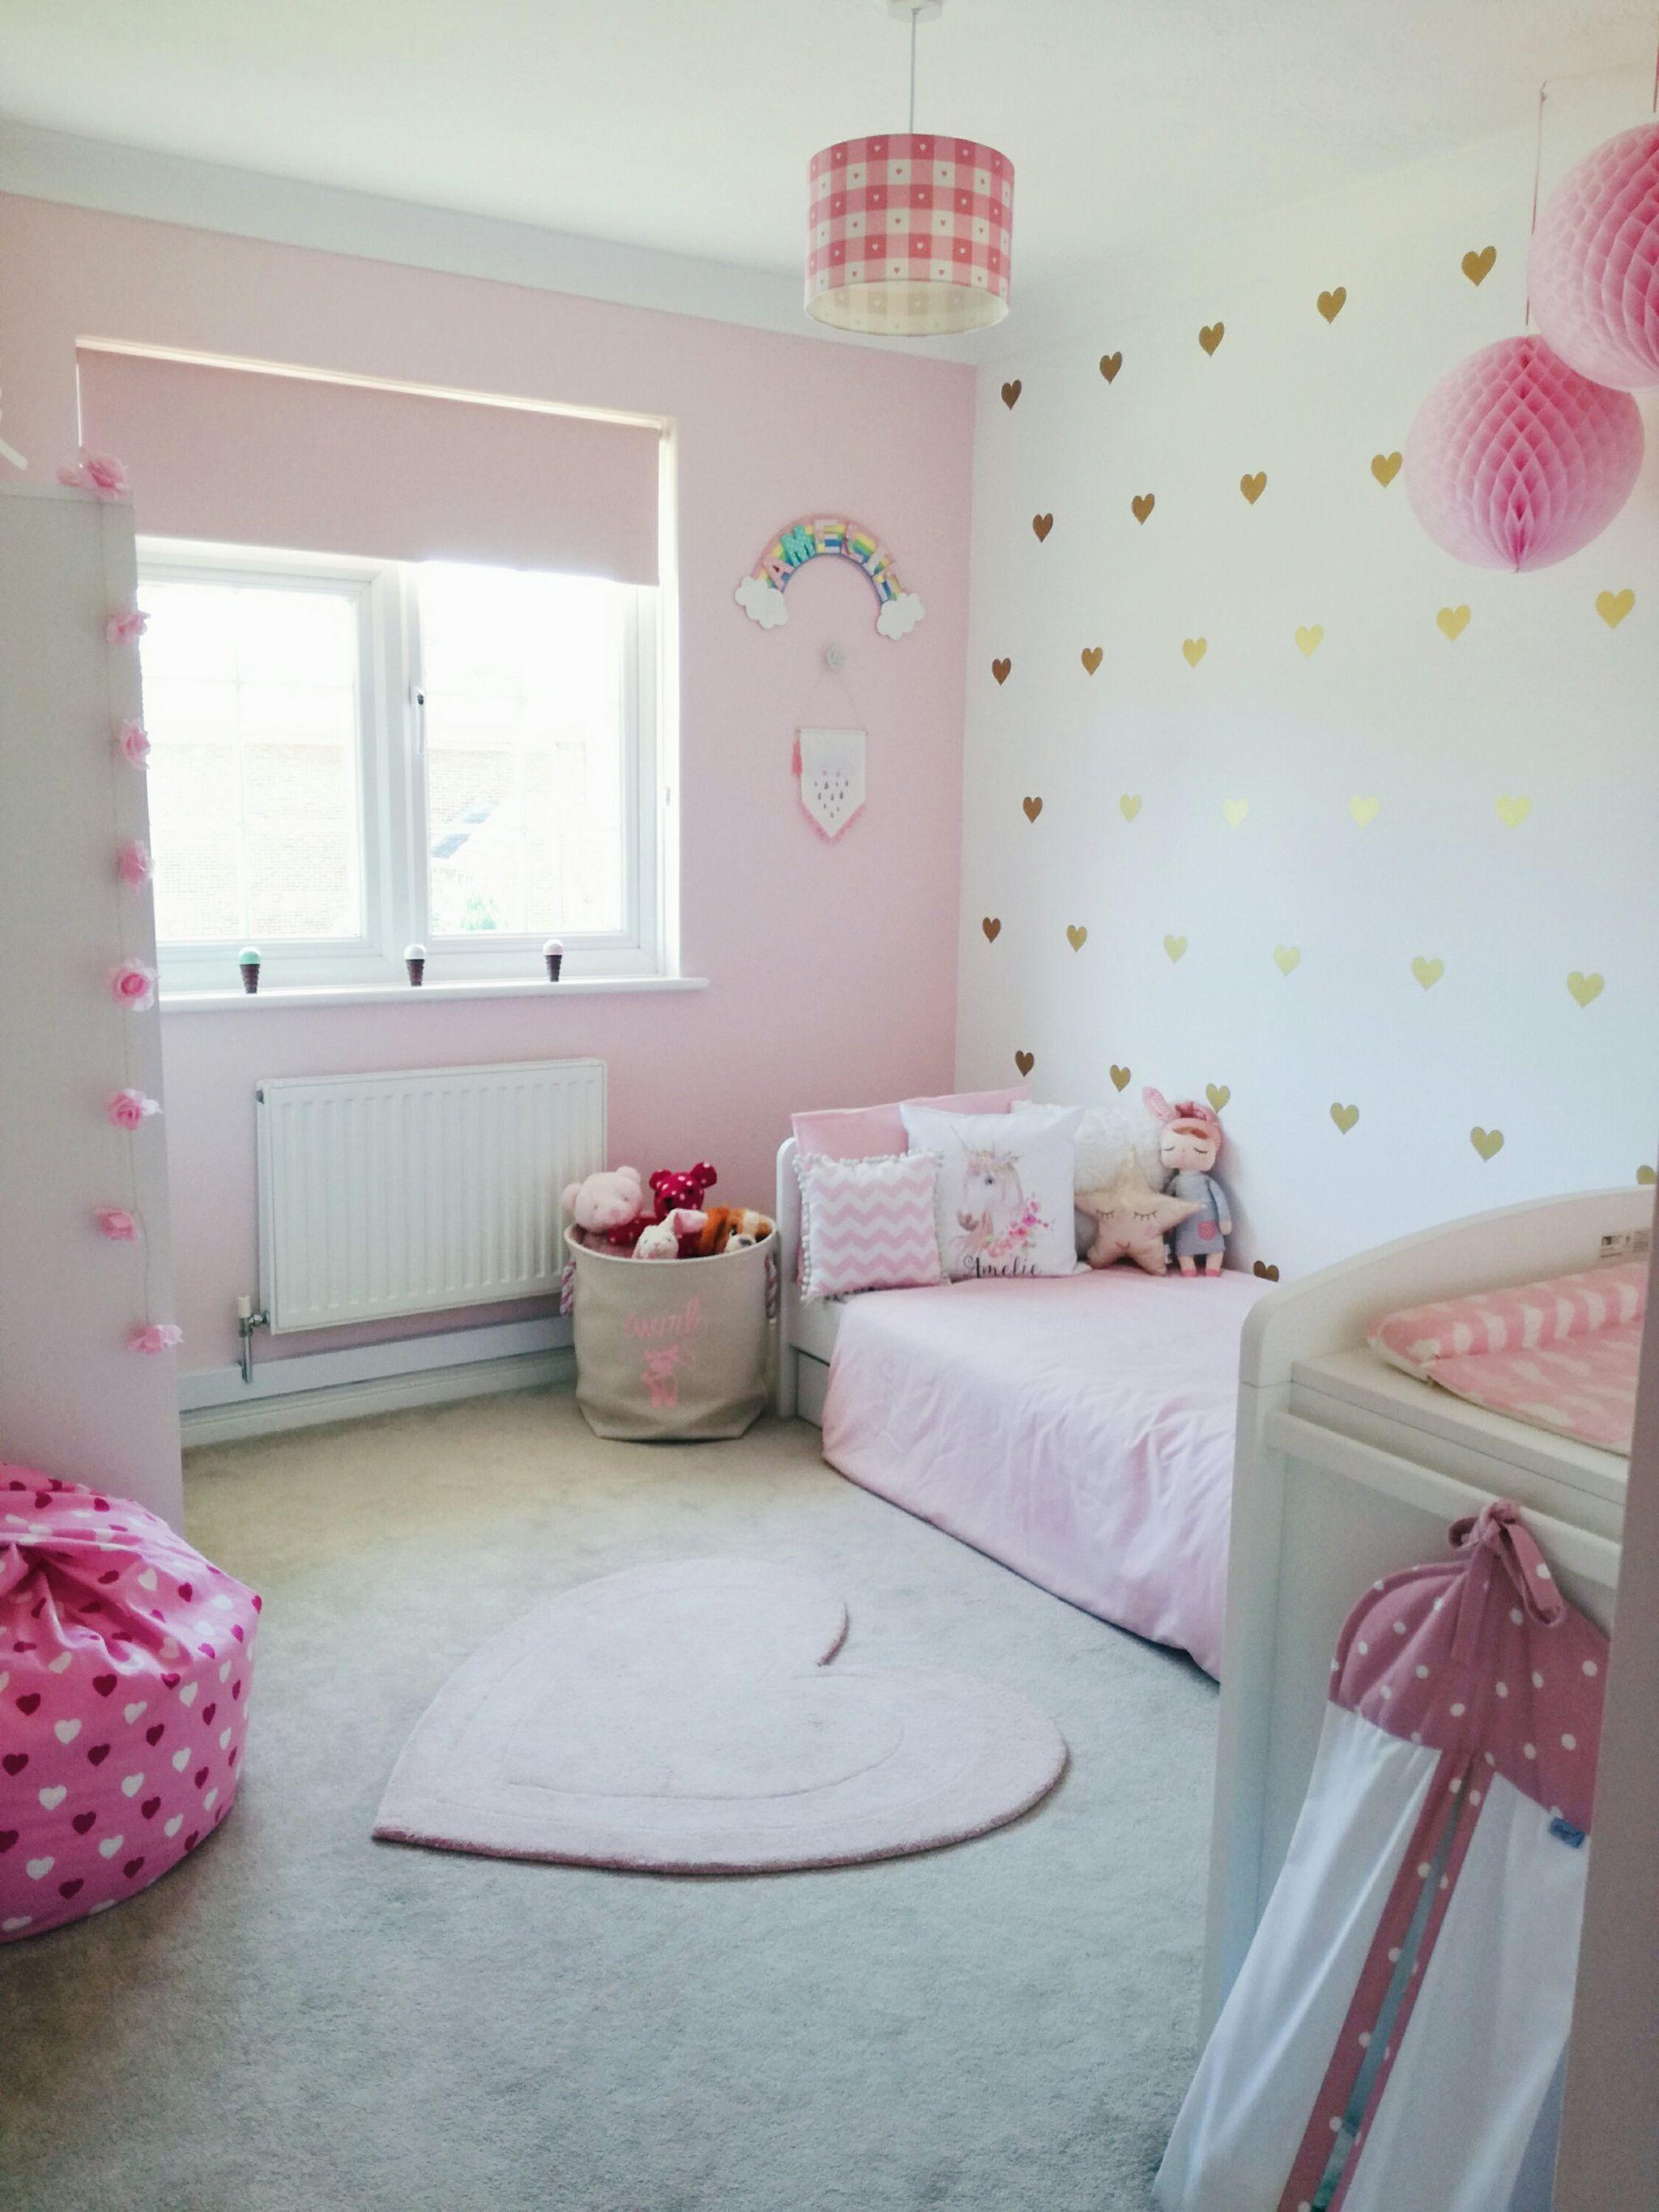 Amelie's Soft Pink and Gold Toddler Bedroom images